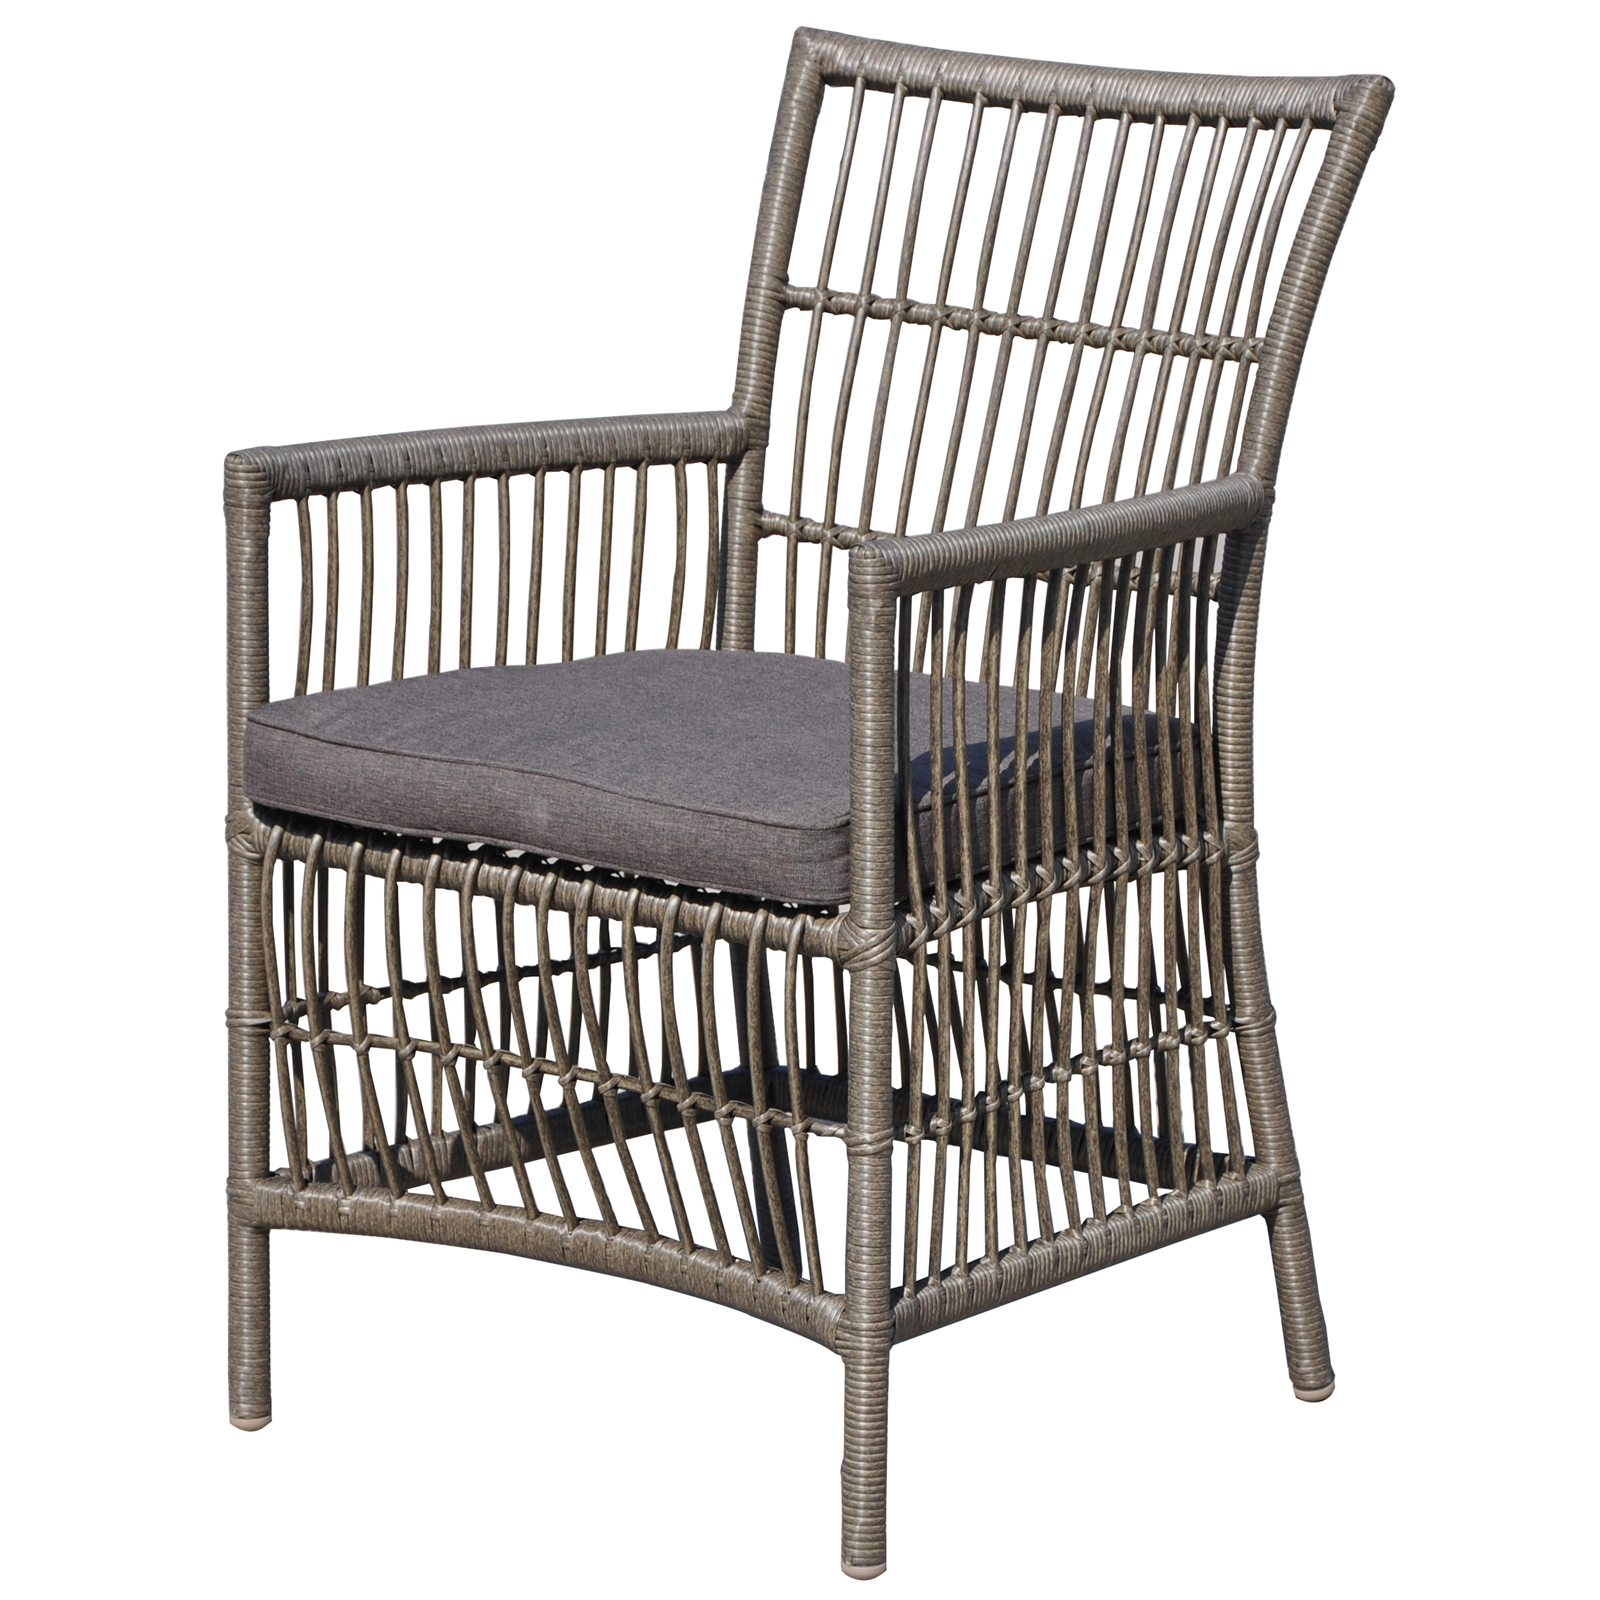 Swing Chair Bunnings Tri Fold Lawn Target Mimosa Waiheke Resin Wicker Warehouse